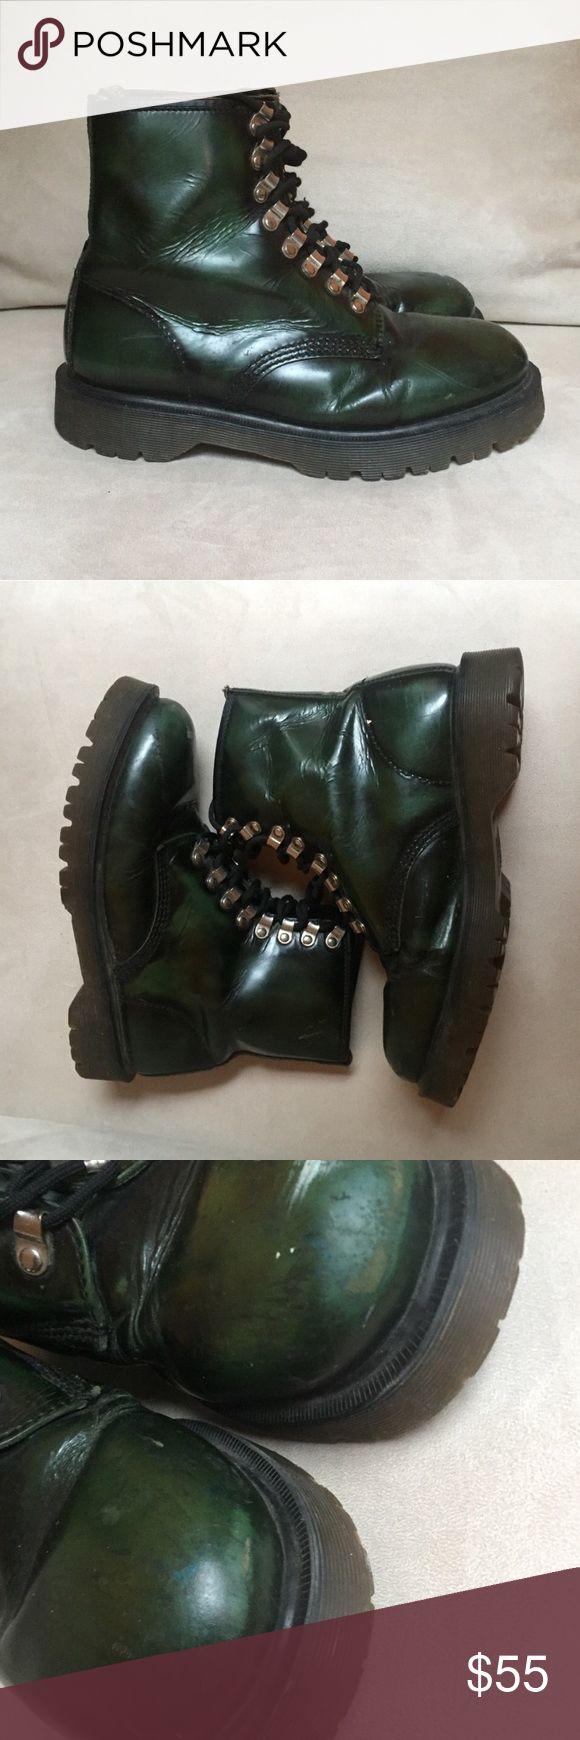 Dr. Martens Green Lace Up Combat Boots Dr. Martens Green Lace Up Combat Boots size 8 - exterior scuffs shown in photos Dr. Martens Shoes Combat & Moto Boots